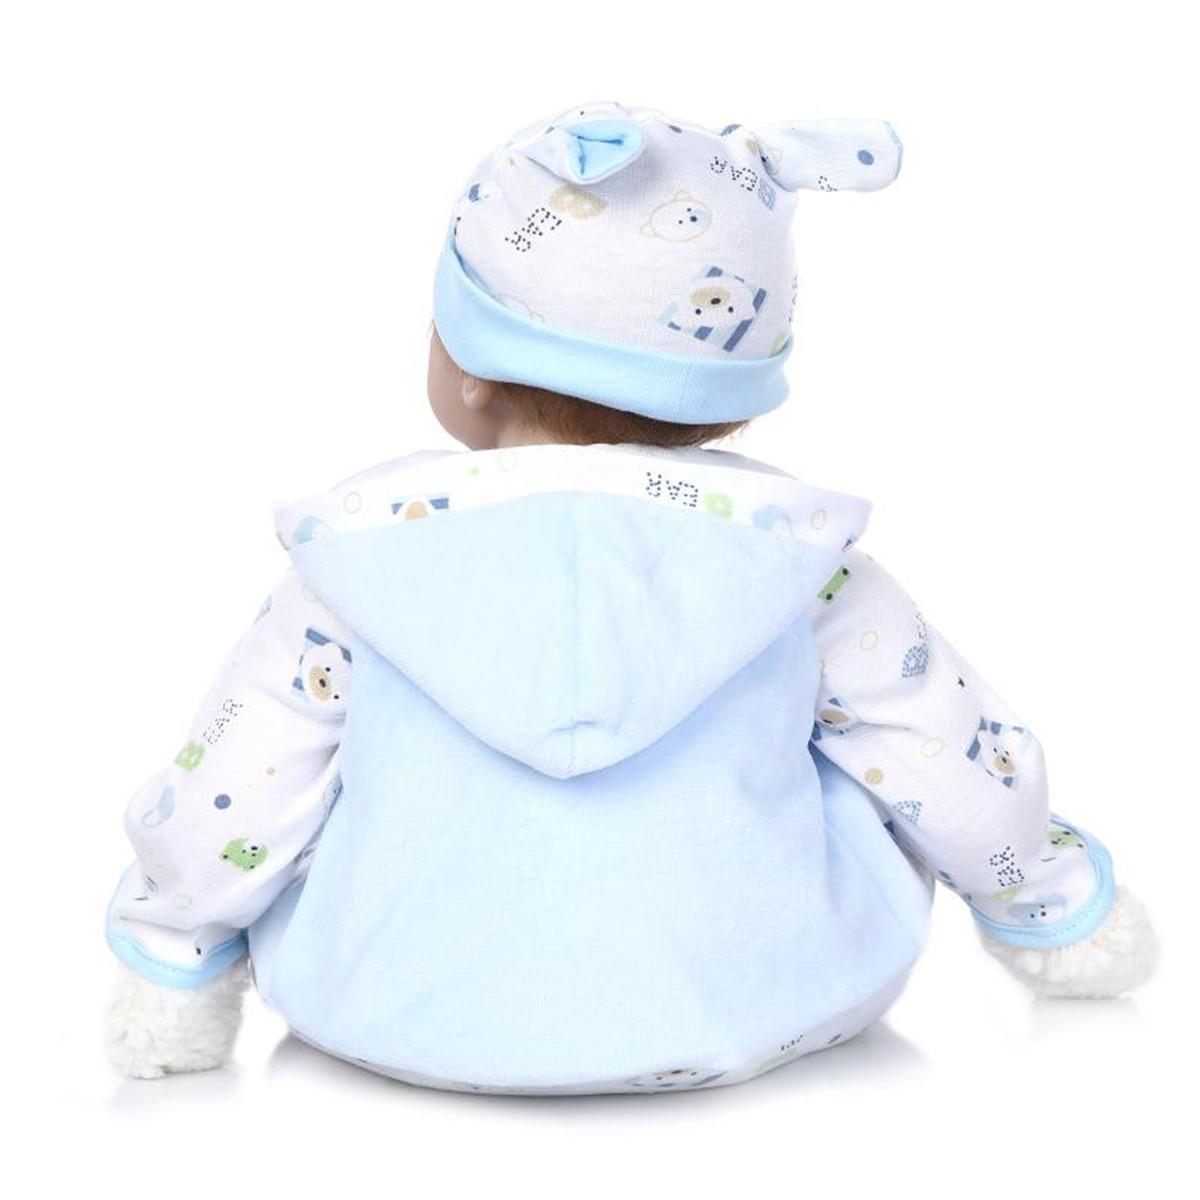 NPK 22inch Reborn Baby Doll Handmade Lifelike Realistic Newborn Kids Toys Silicone Gift